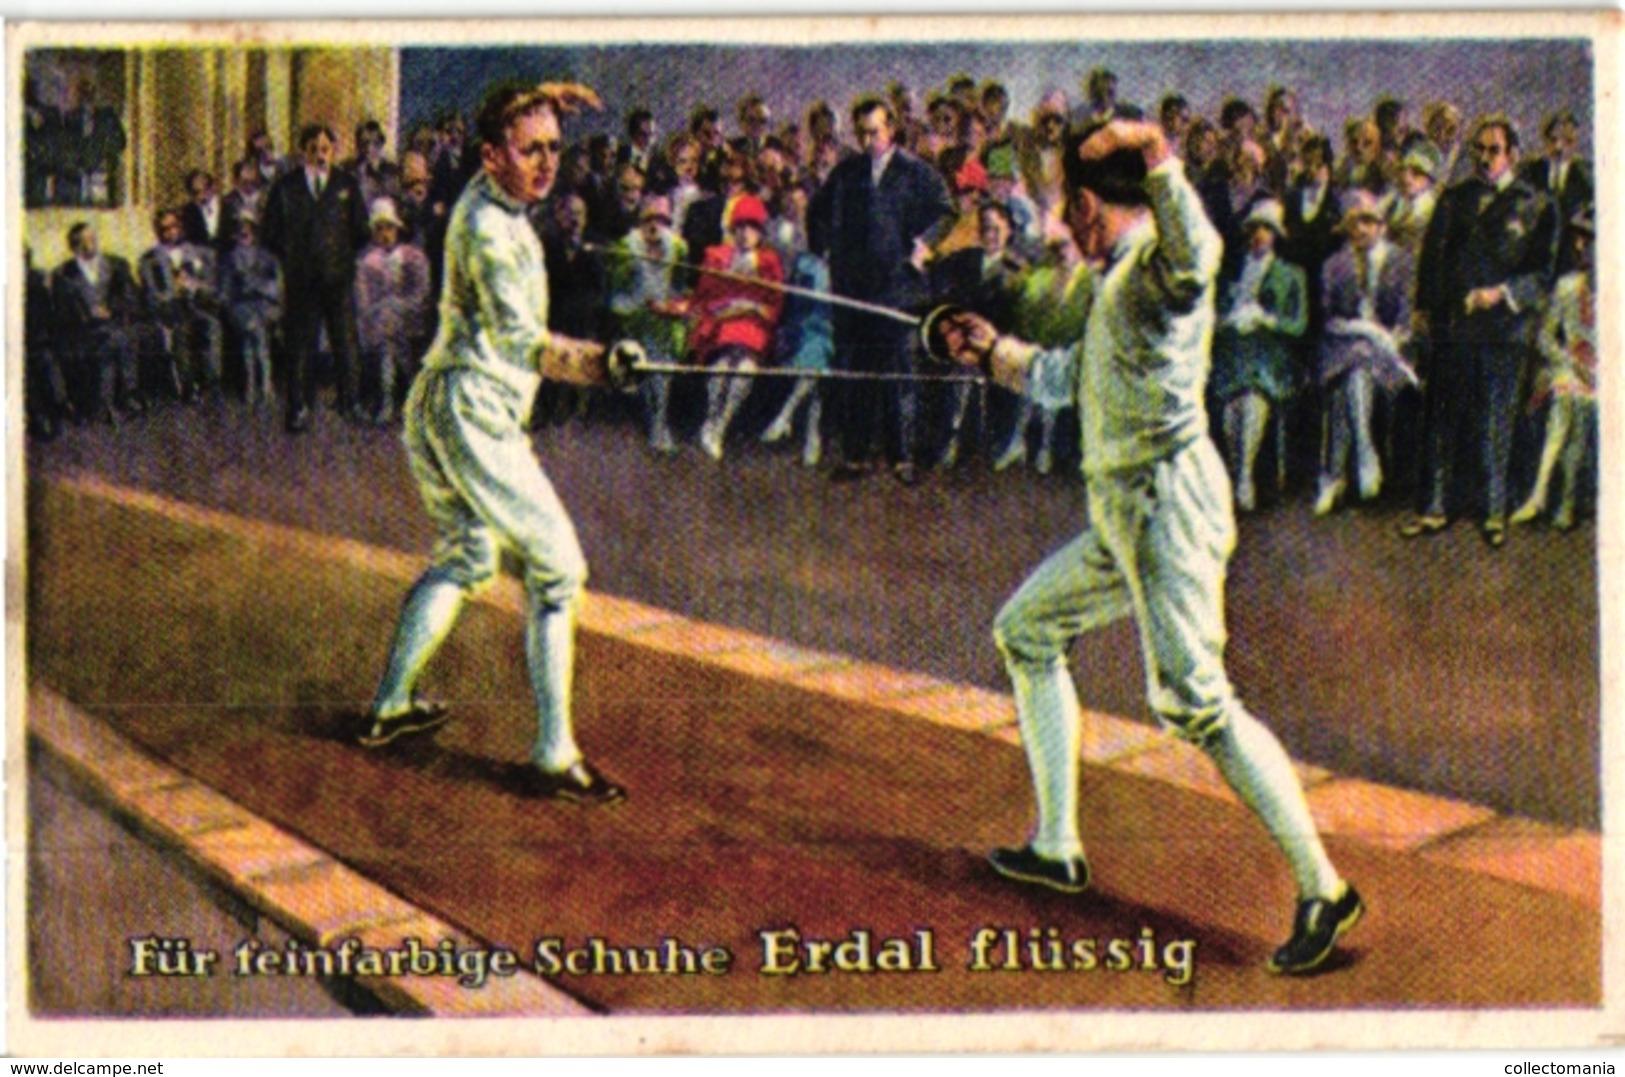 4 Trade Cards Chromo FENCING ESCRIME FECHTEN Pub Erdal - Fencing